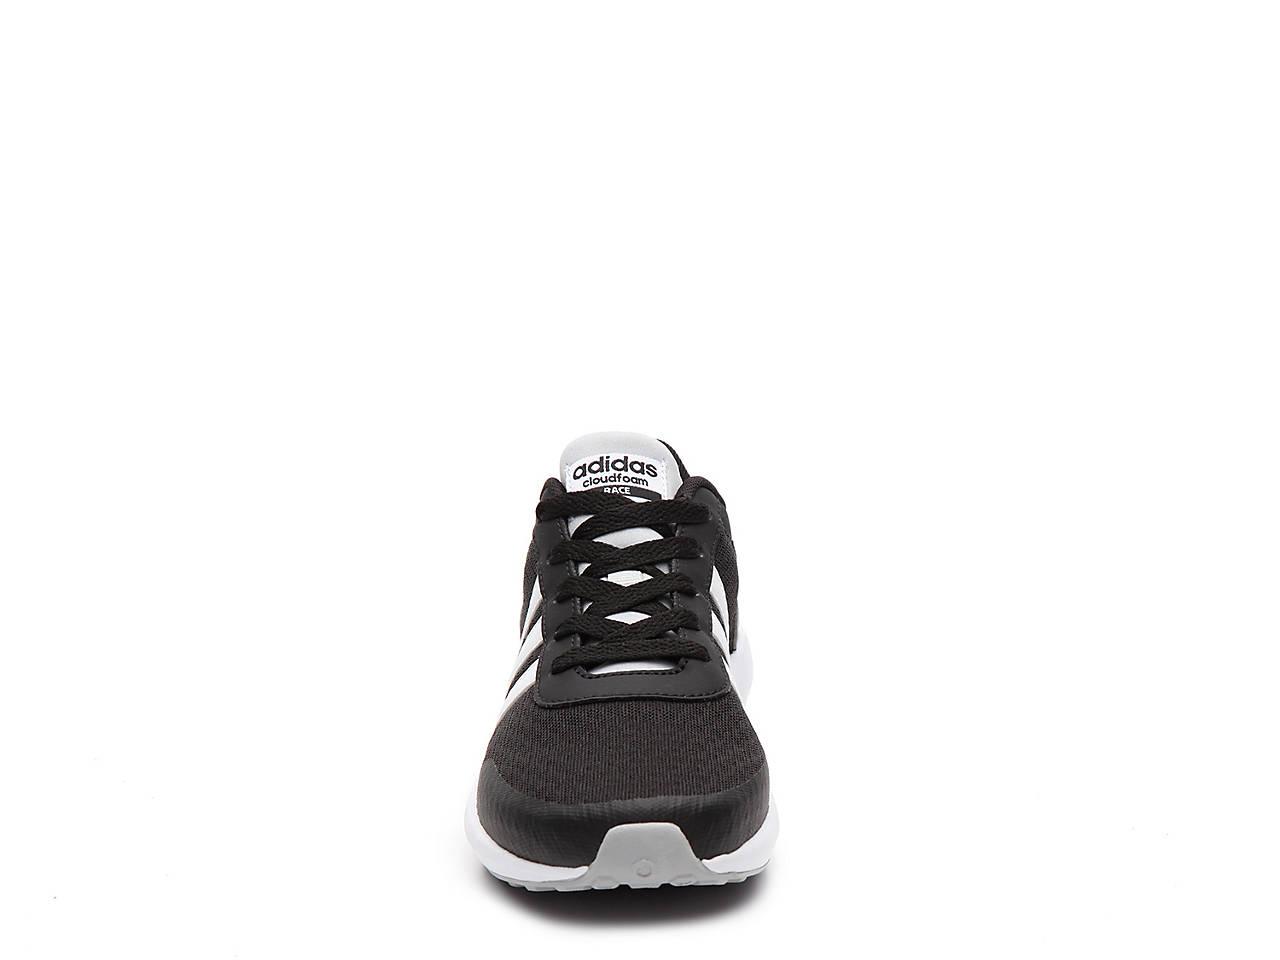 adidas neo cloudfoam gioventù shoesonline